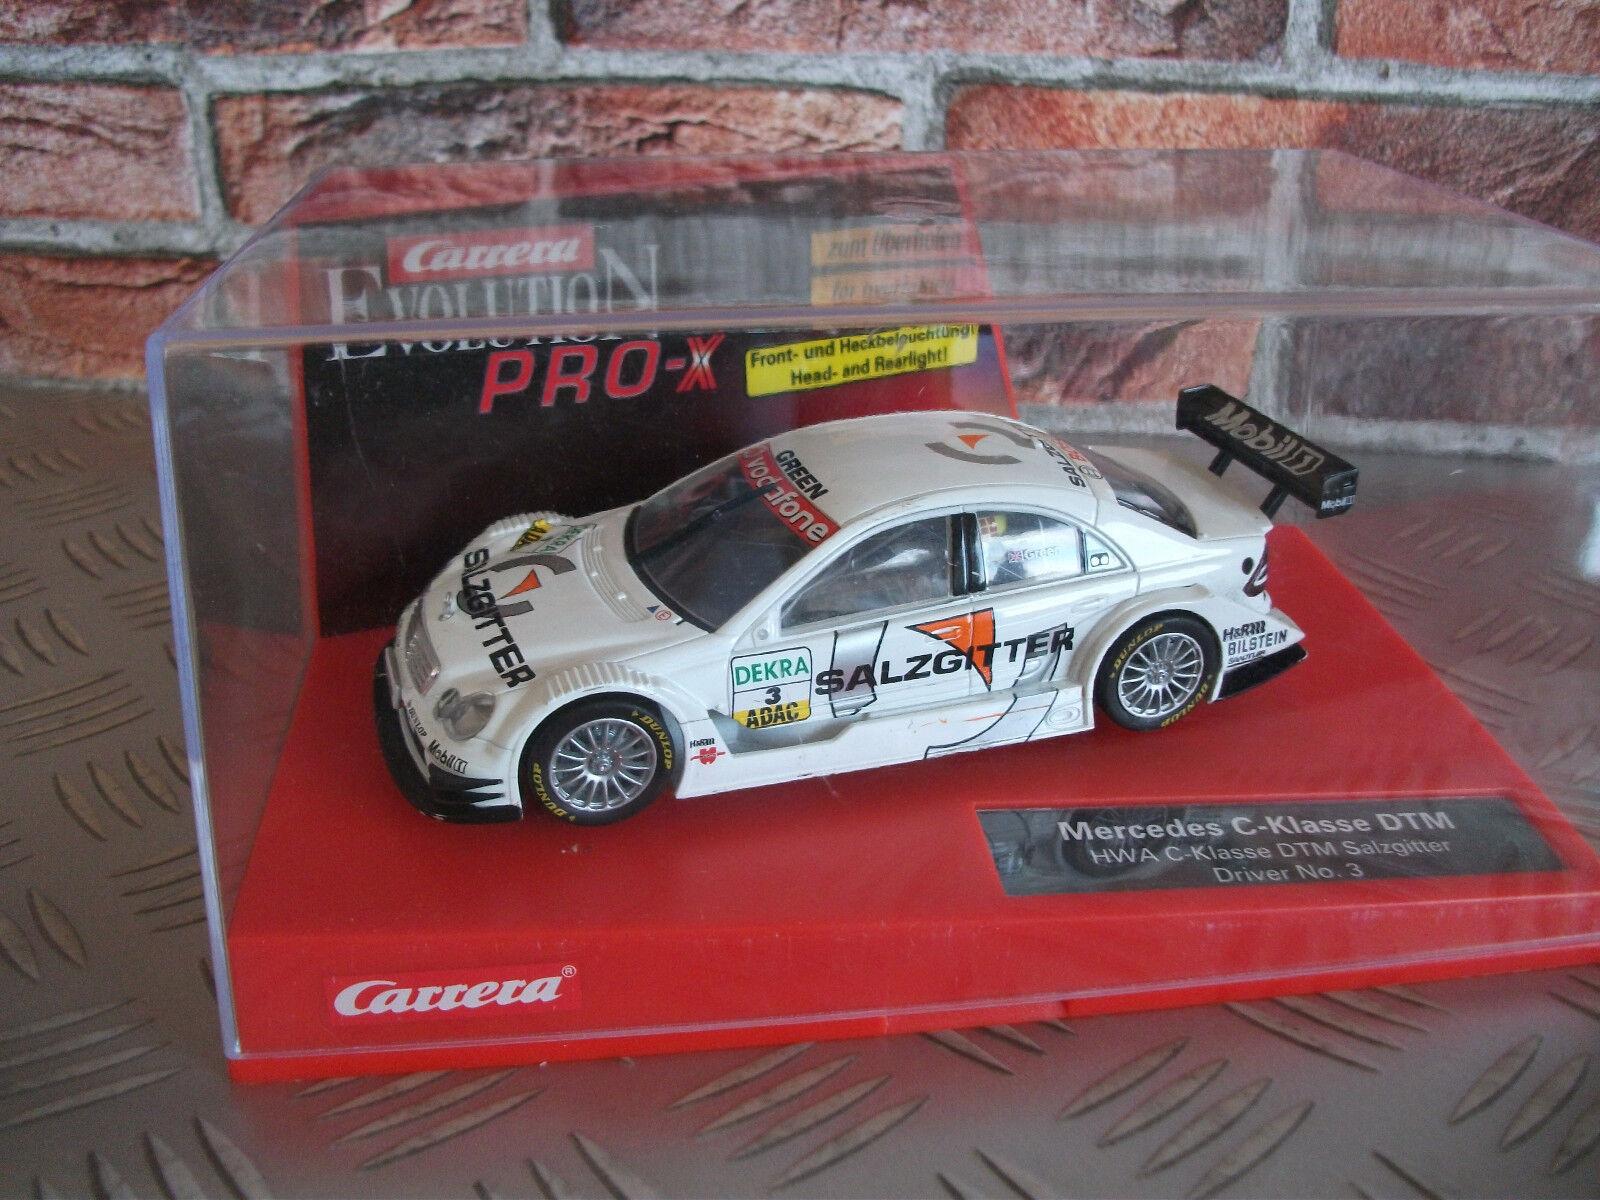 Carrera Evolution PRO-X 30247 1 32 MERCEDES C-KLASSE DTM Rarität